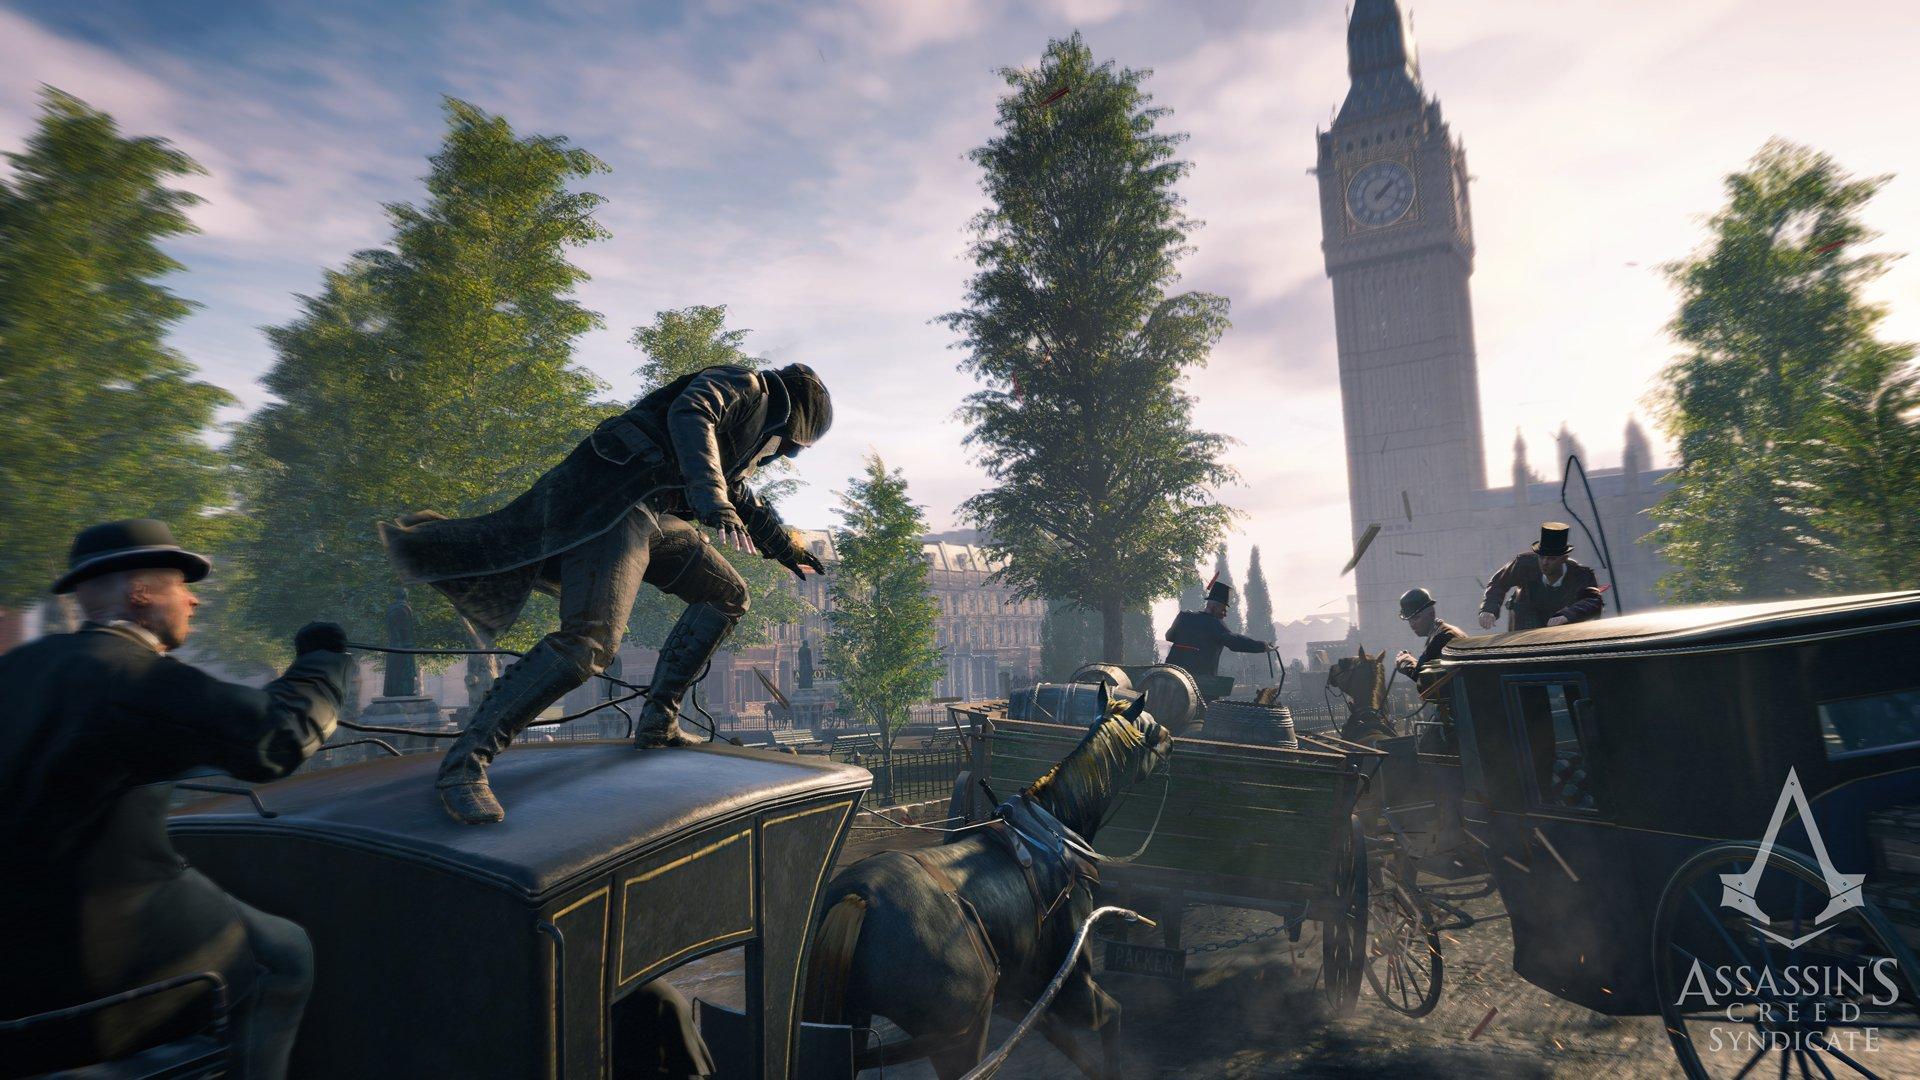 Интересности об Assassin's Creed Syndicate - Изображение 2